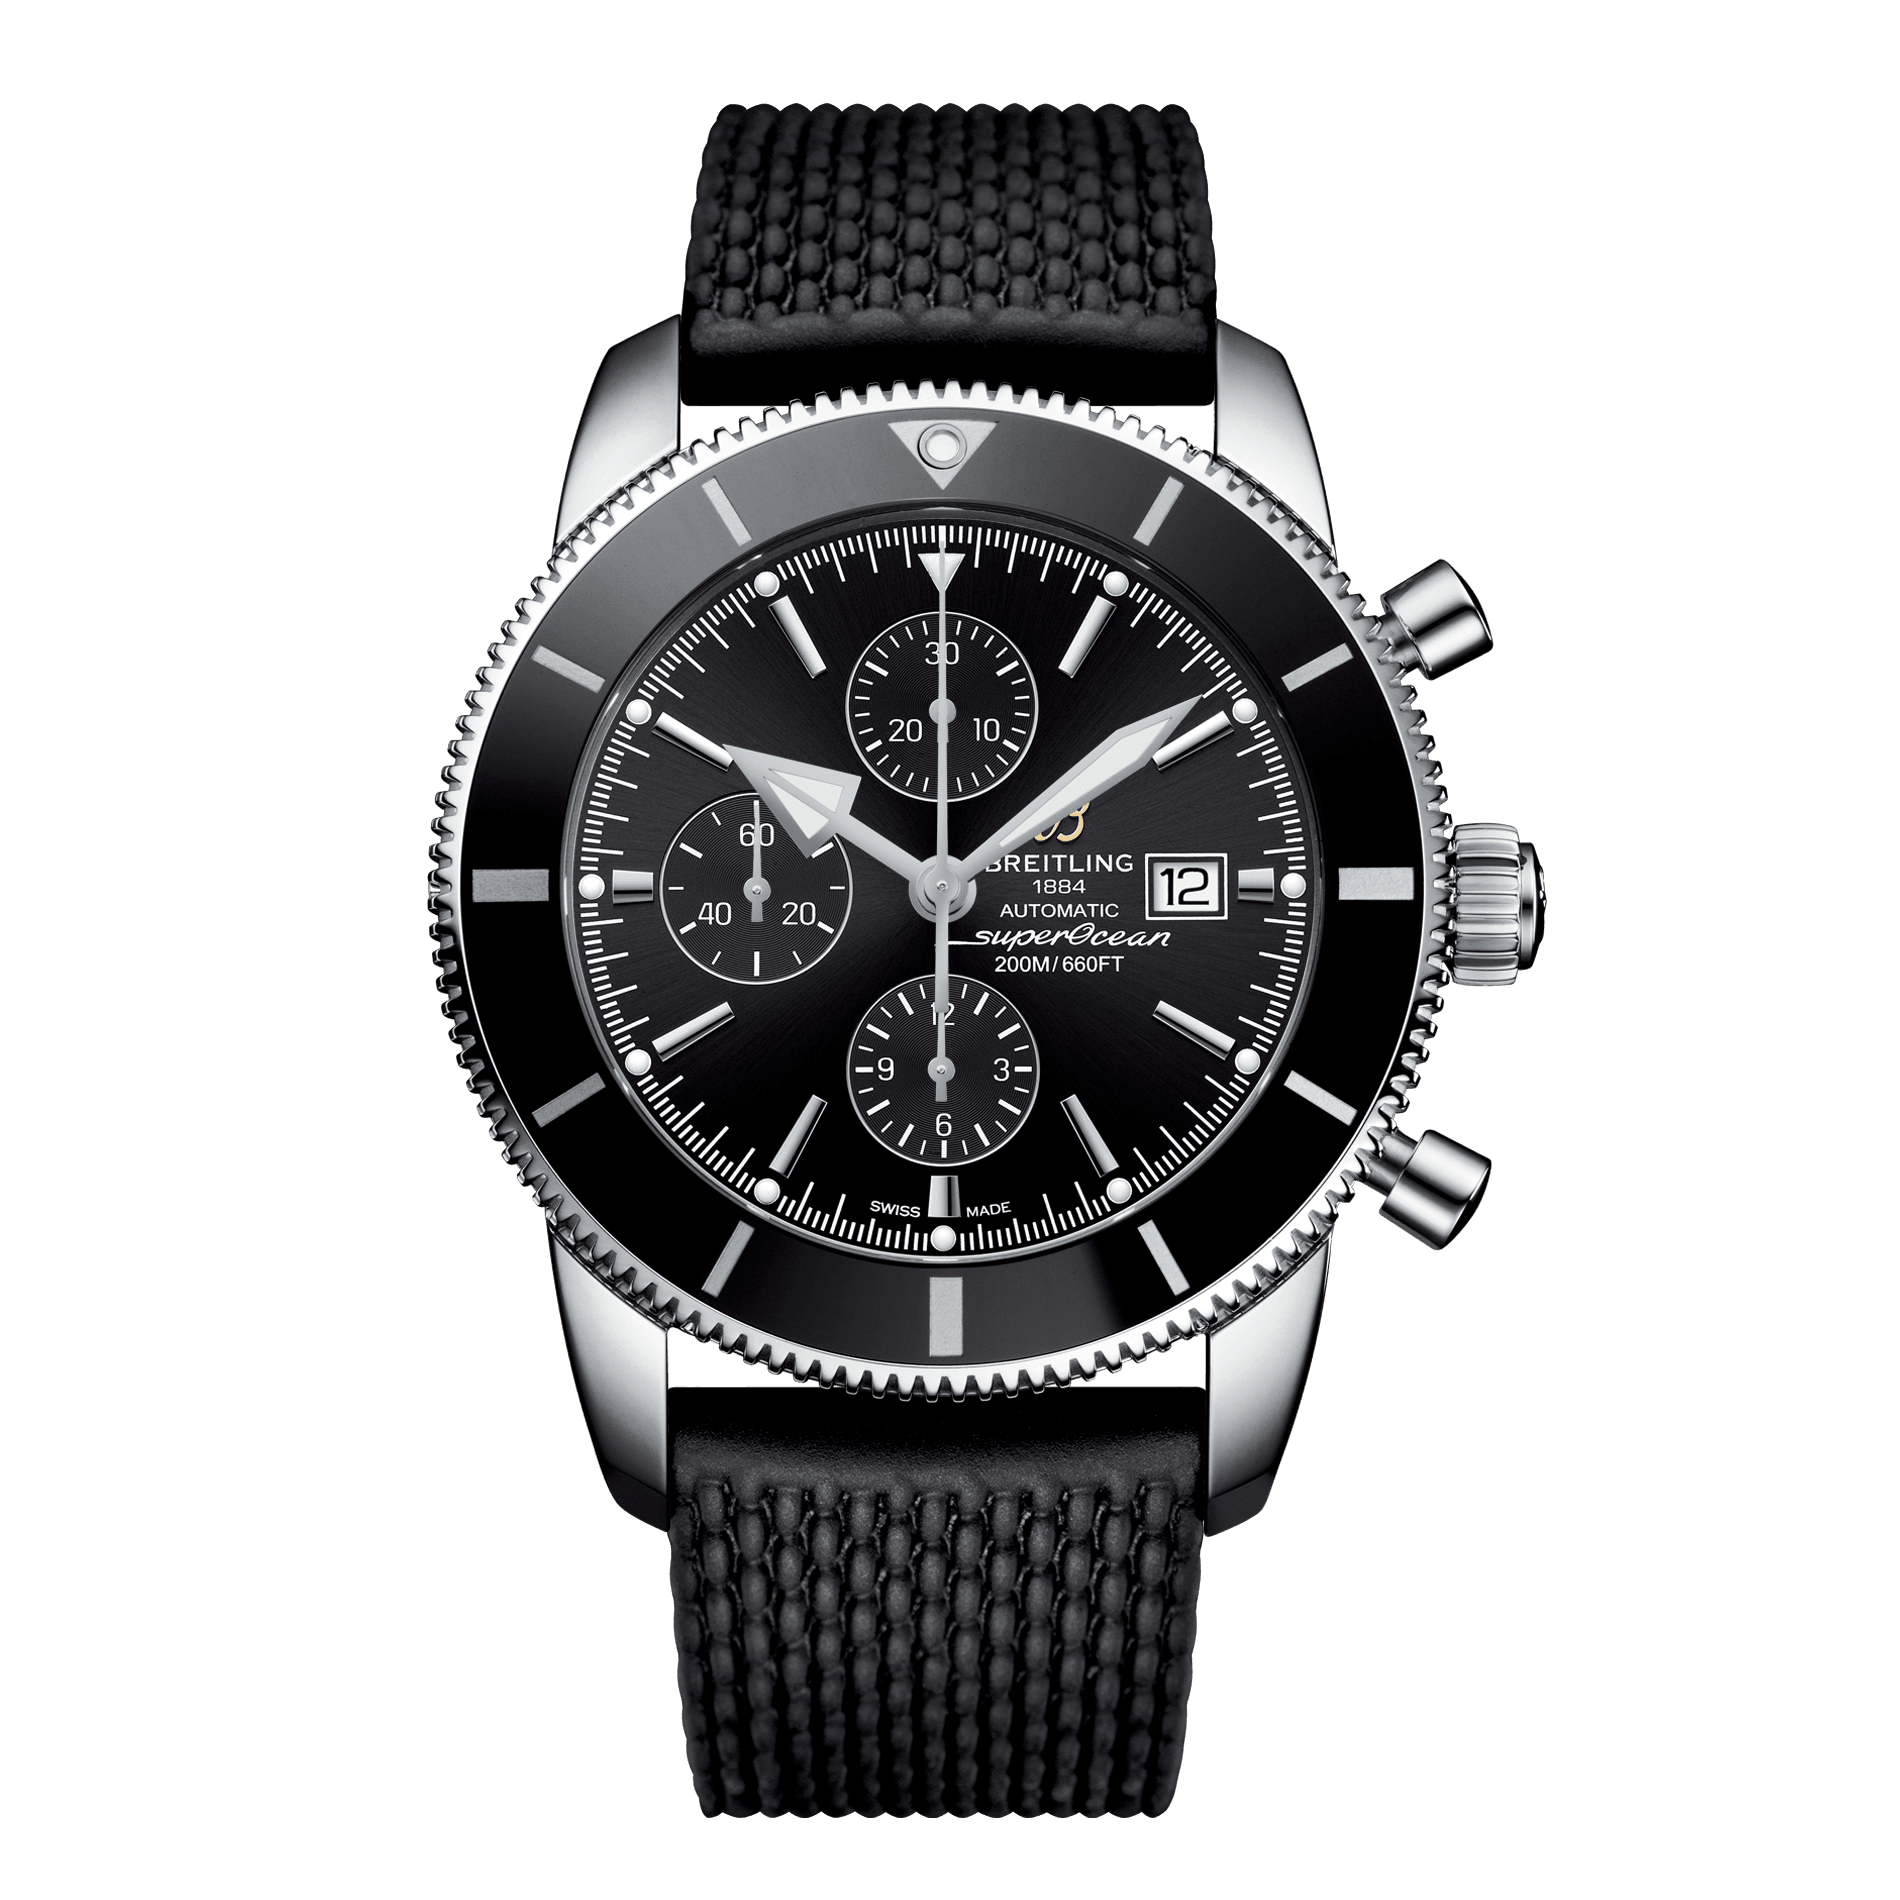 Reloj Breitling – Superocean Heritage 46 - Amaya Joyeros